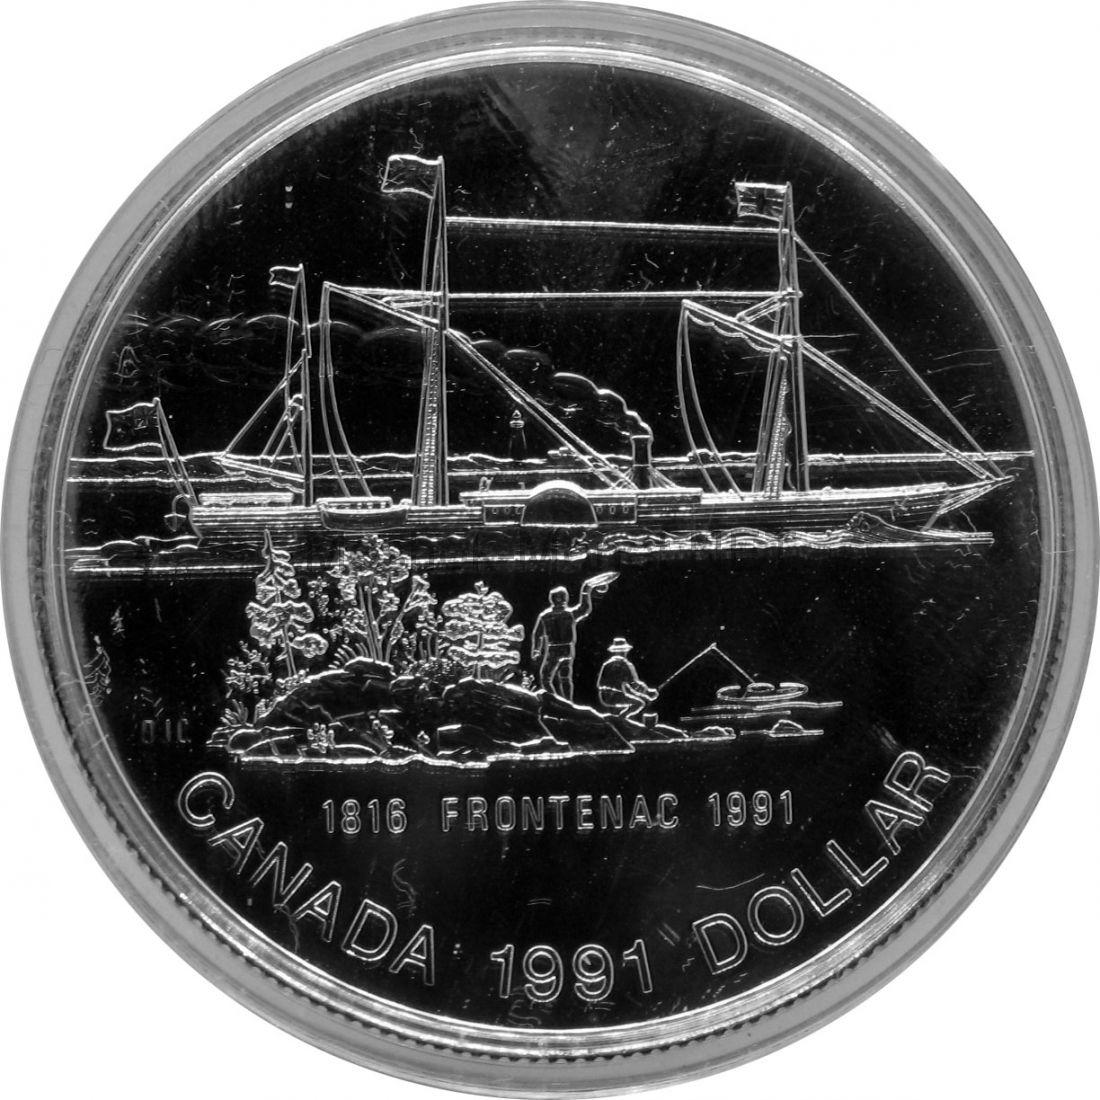 Канада 1 доллар 1991 г. S.S. Frontenac